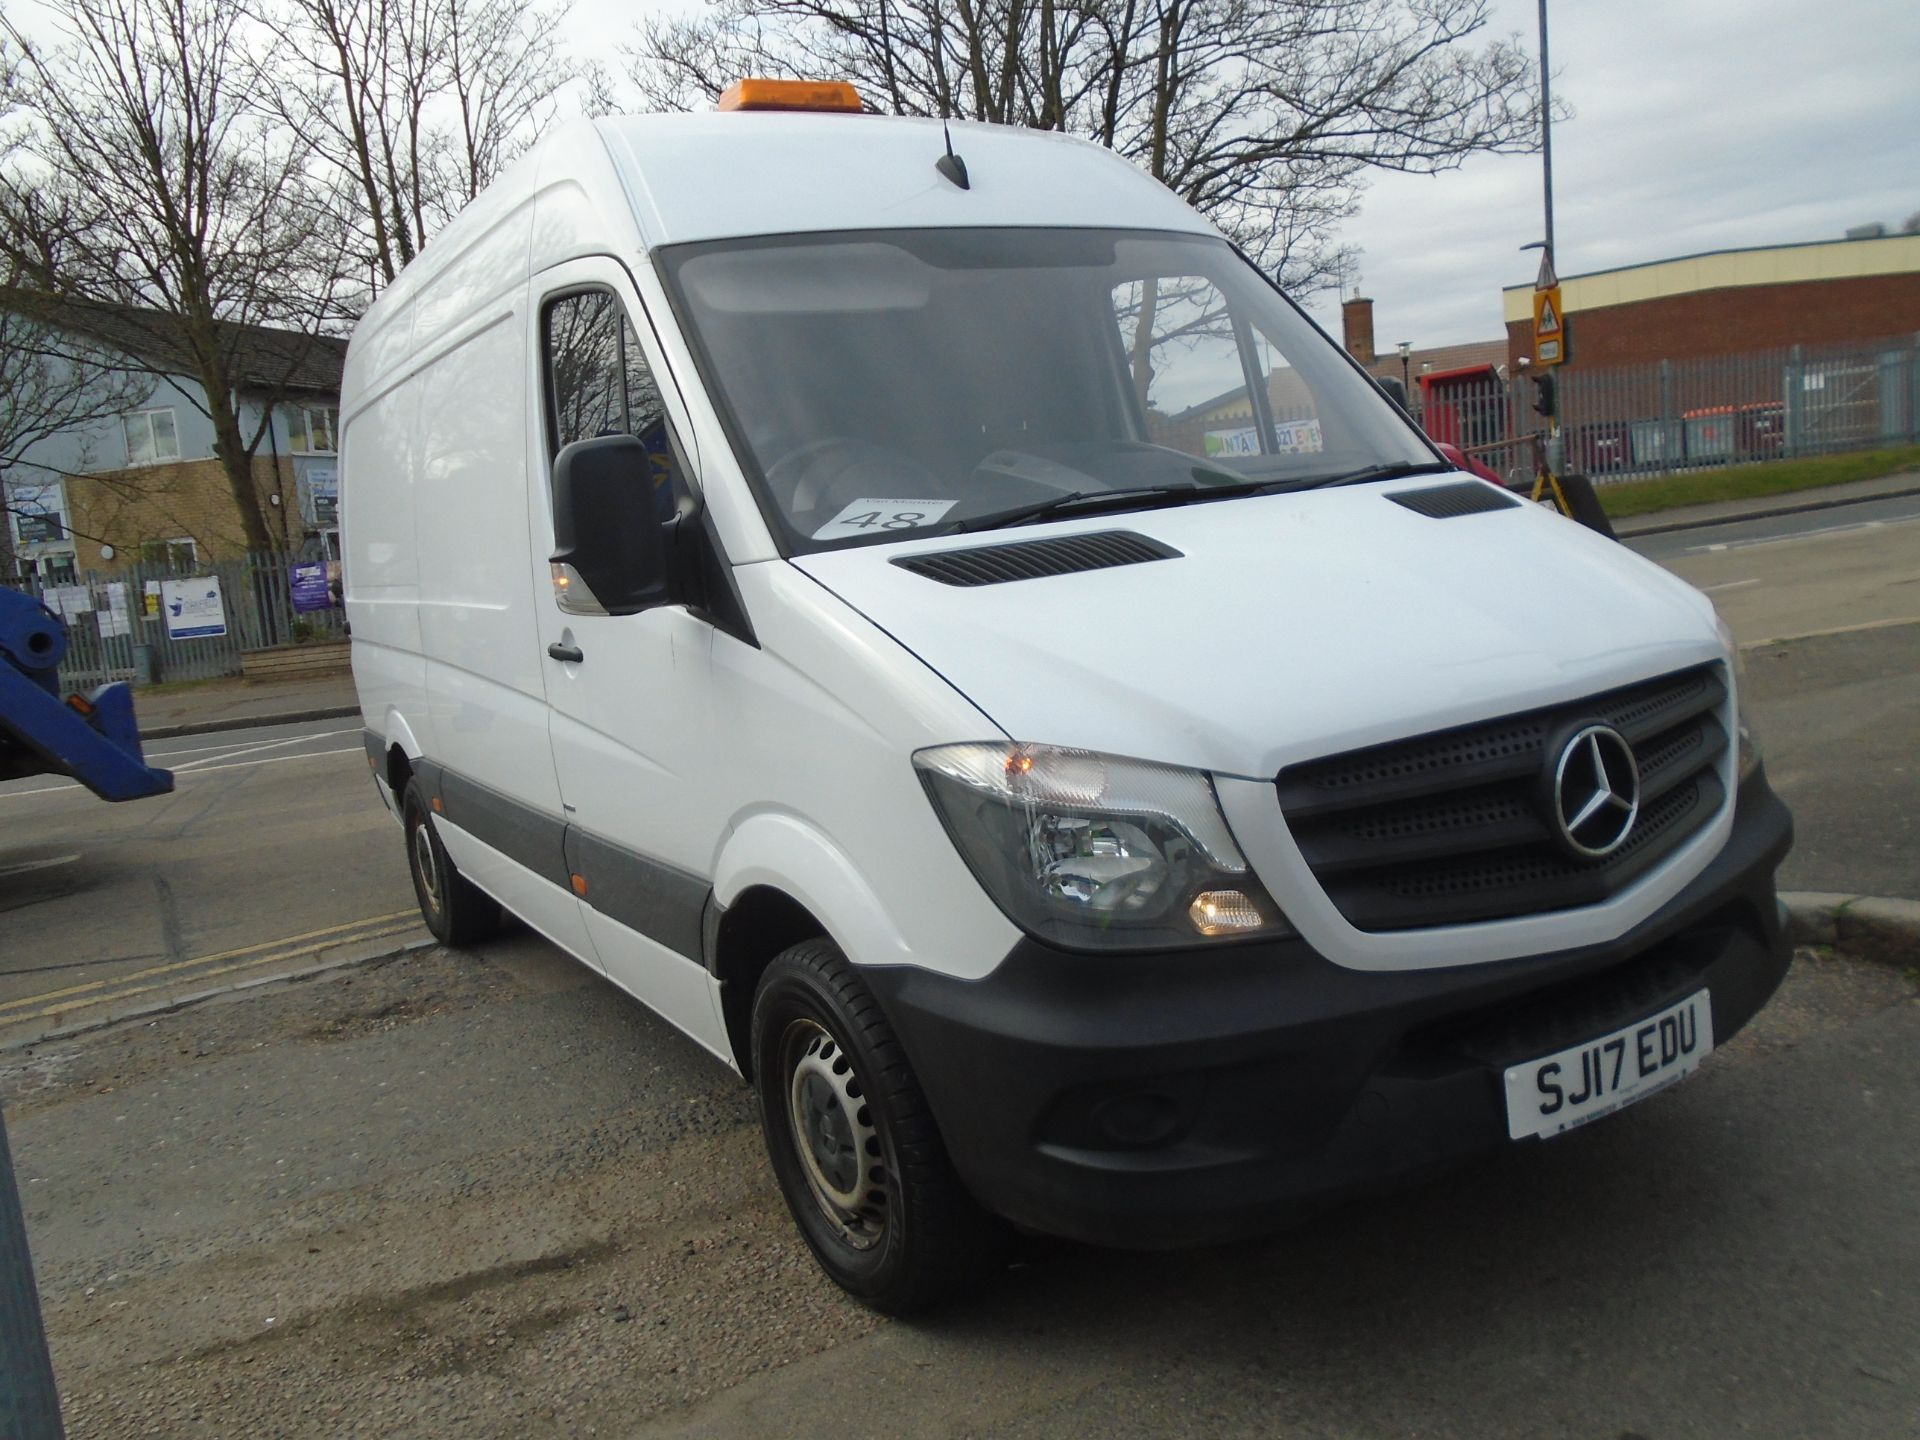 2017 Mercedes-Benz Sprinter 3.5T Van (SJ17EDU) Image 1